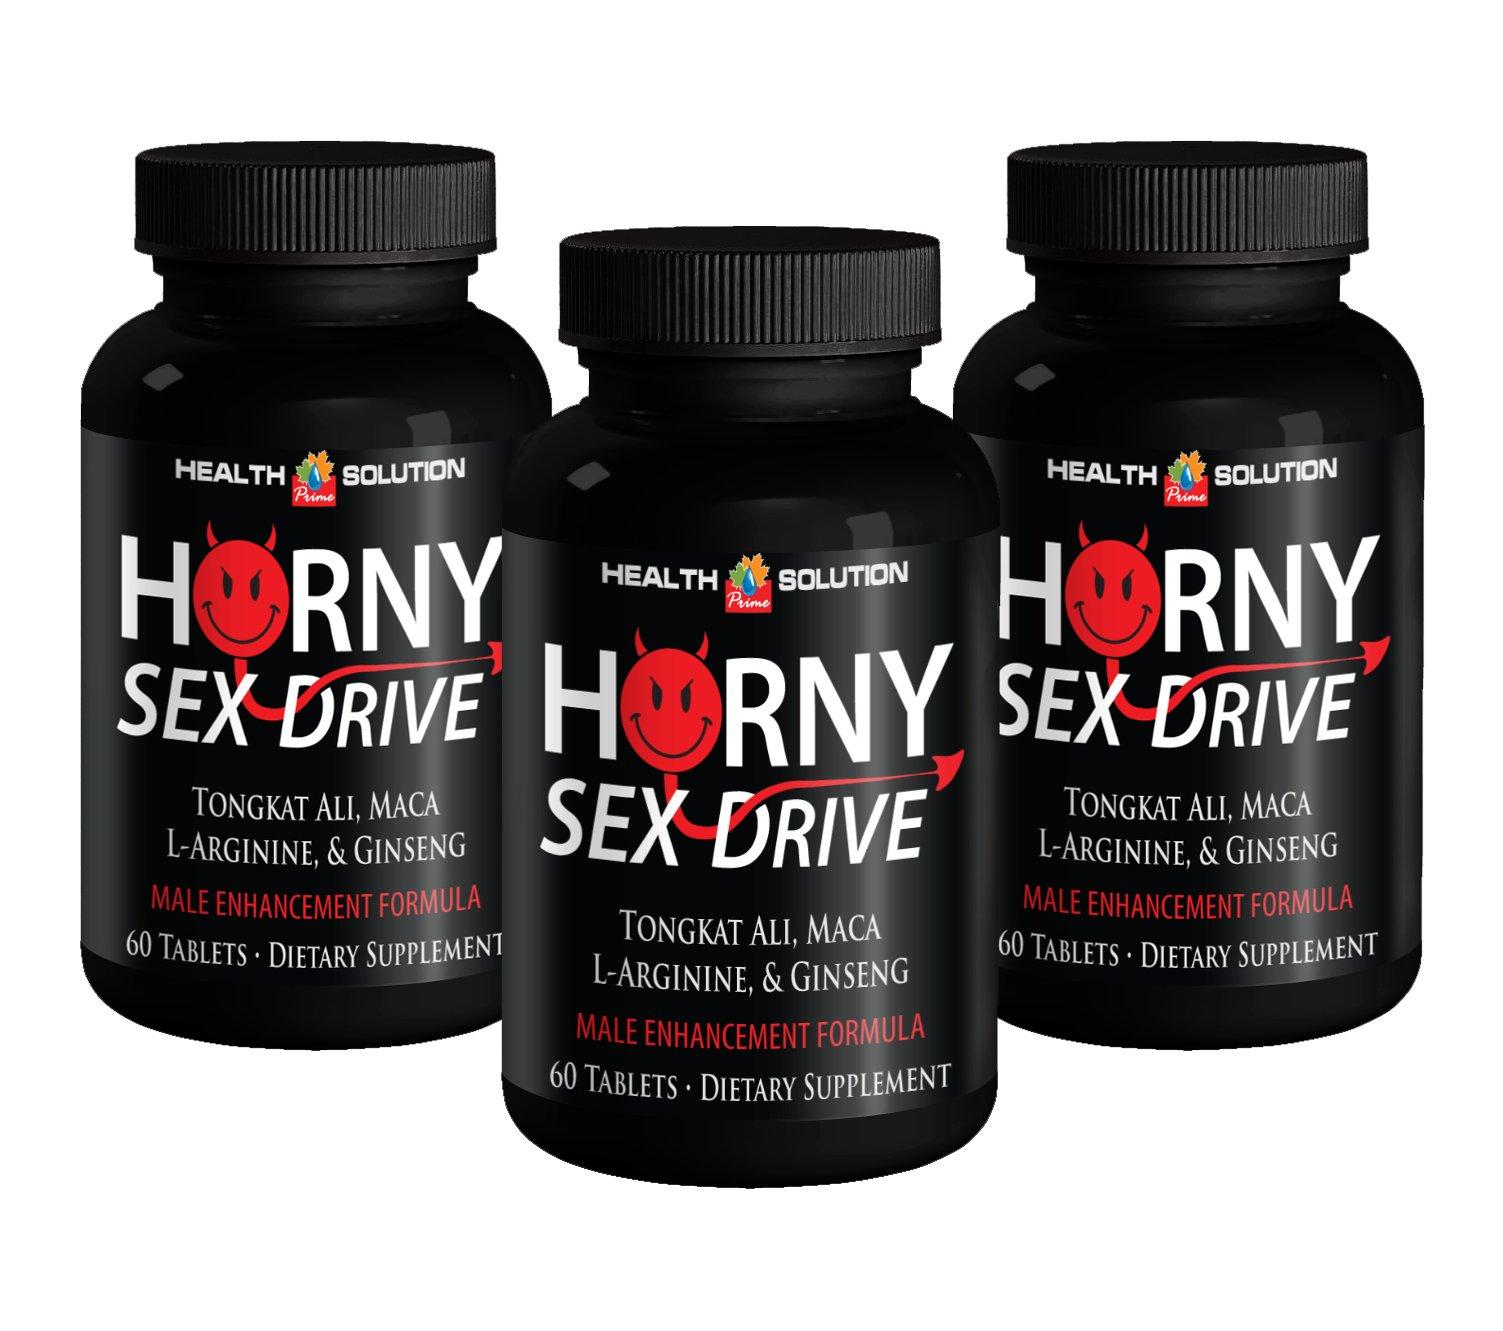 Natural libido booster for men - HORNY SEX DRIVE - Tribulus terrestris - 3 Bottles 180 Tablets